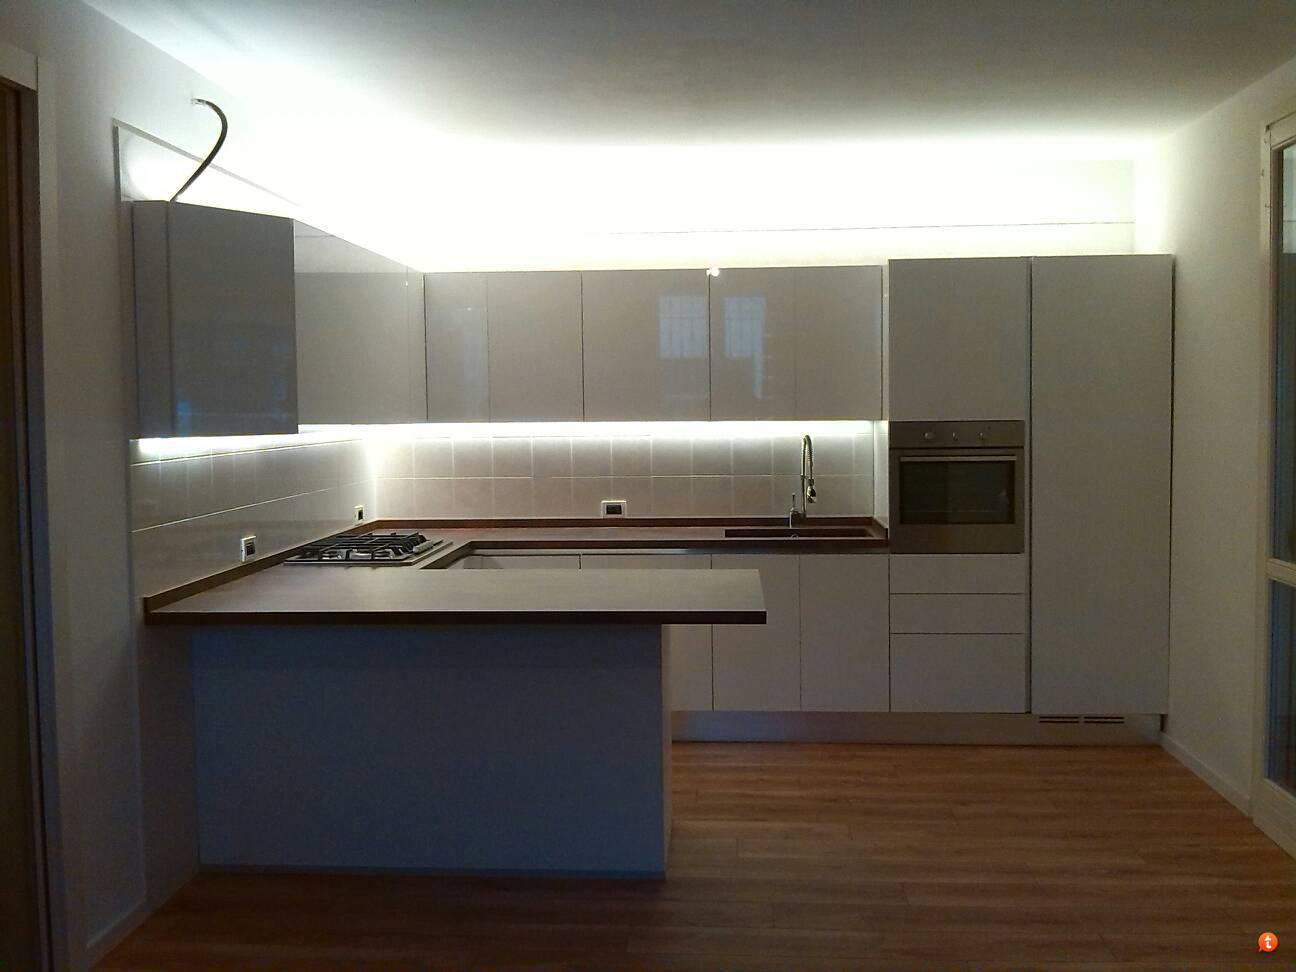 Emejing Led Pensili Cucina Contemporary - bakeroffroad.us ...